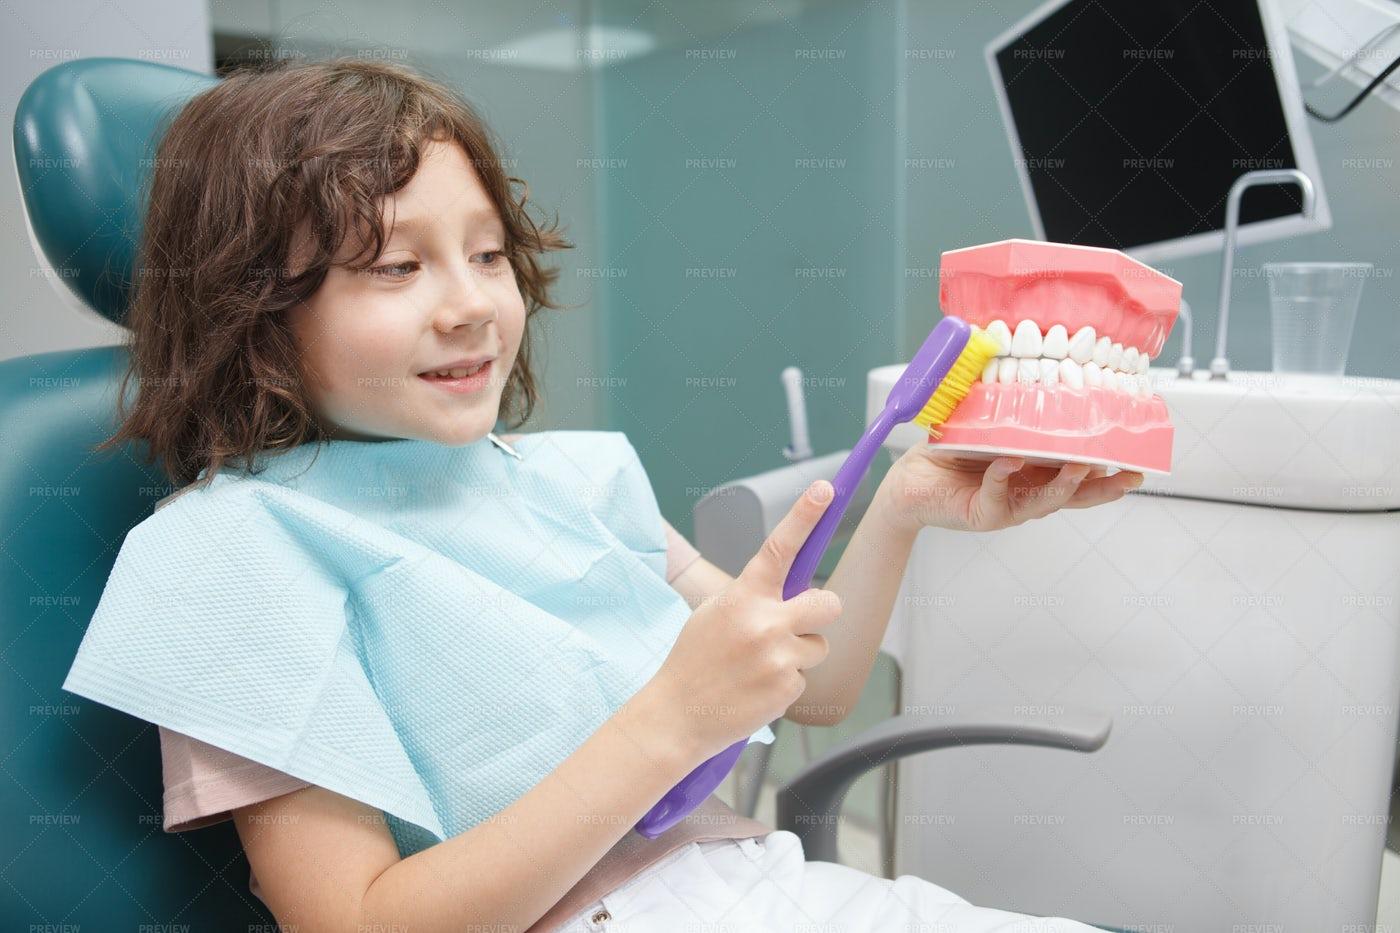 Boy Learning Brushing Teeth: Stock Photos